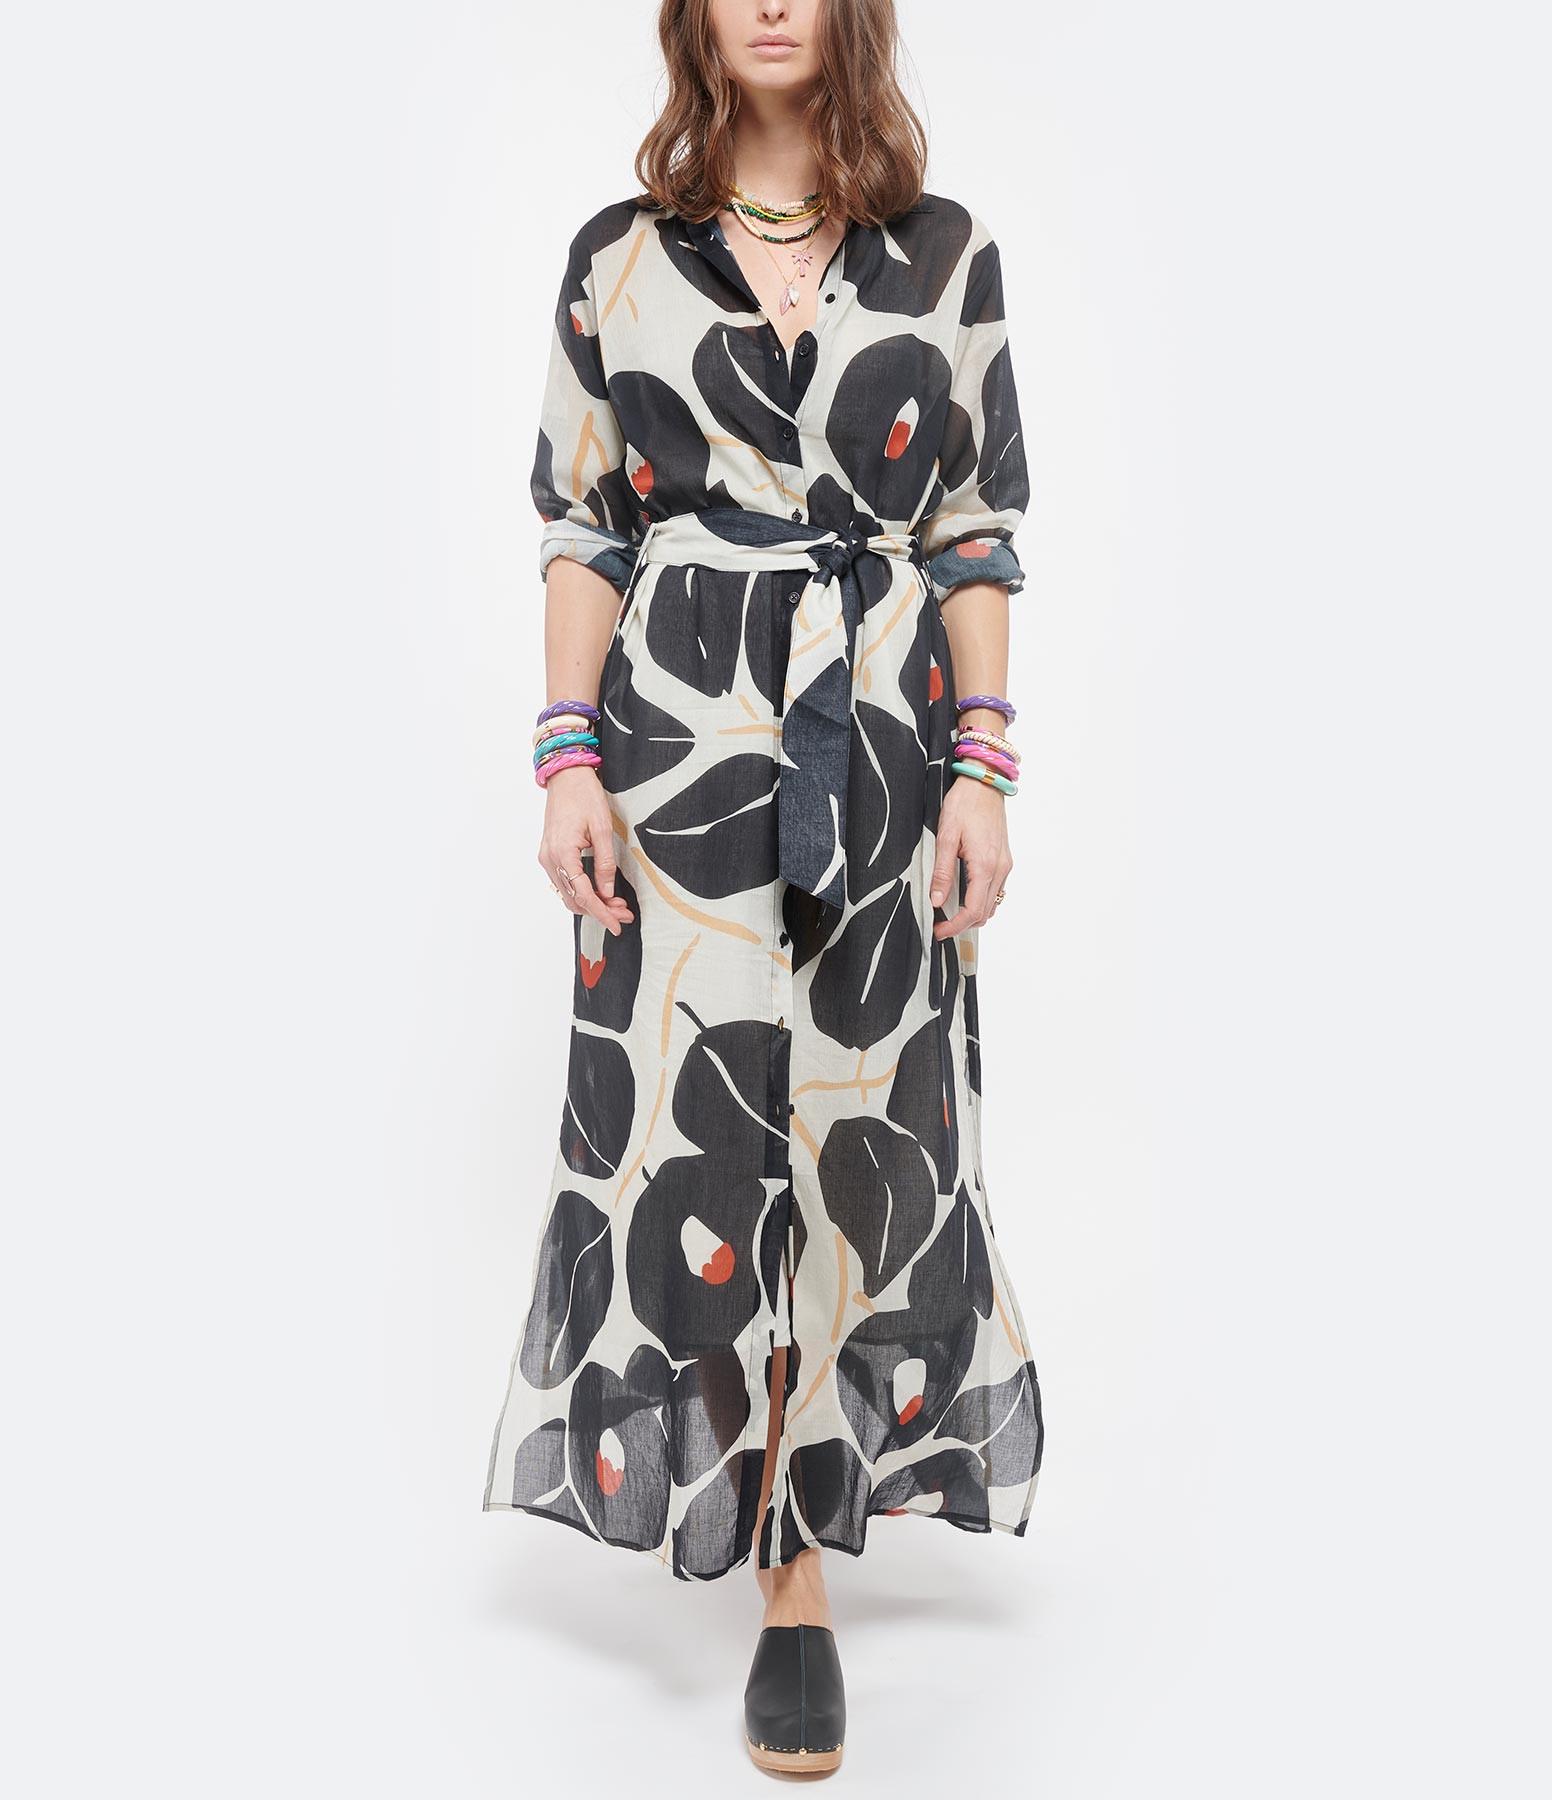 MARE DI LATTE - Robe Murano Coton Noir Imprimé Œillets